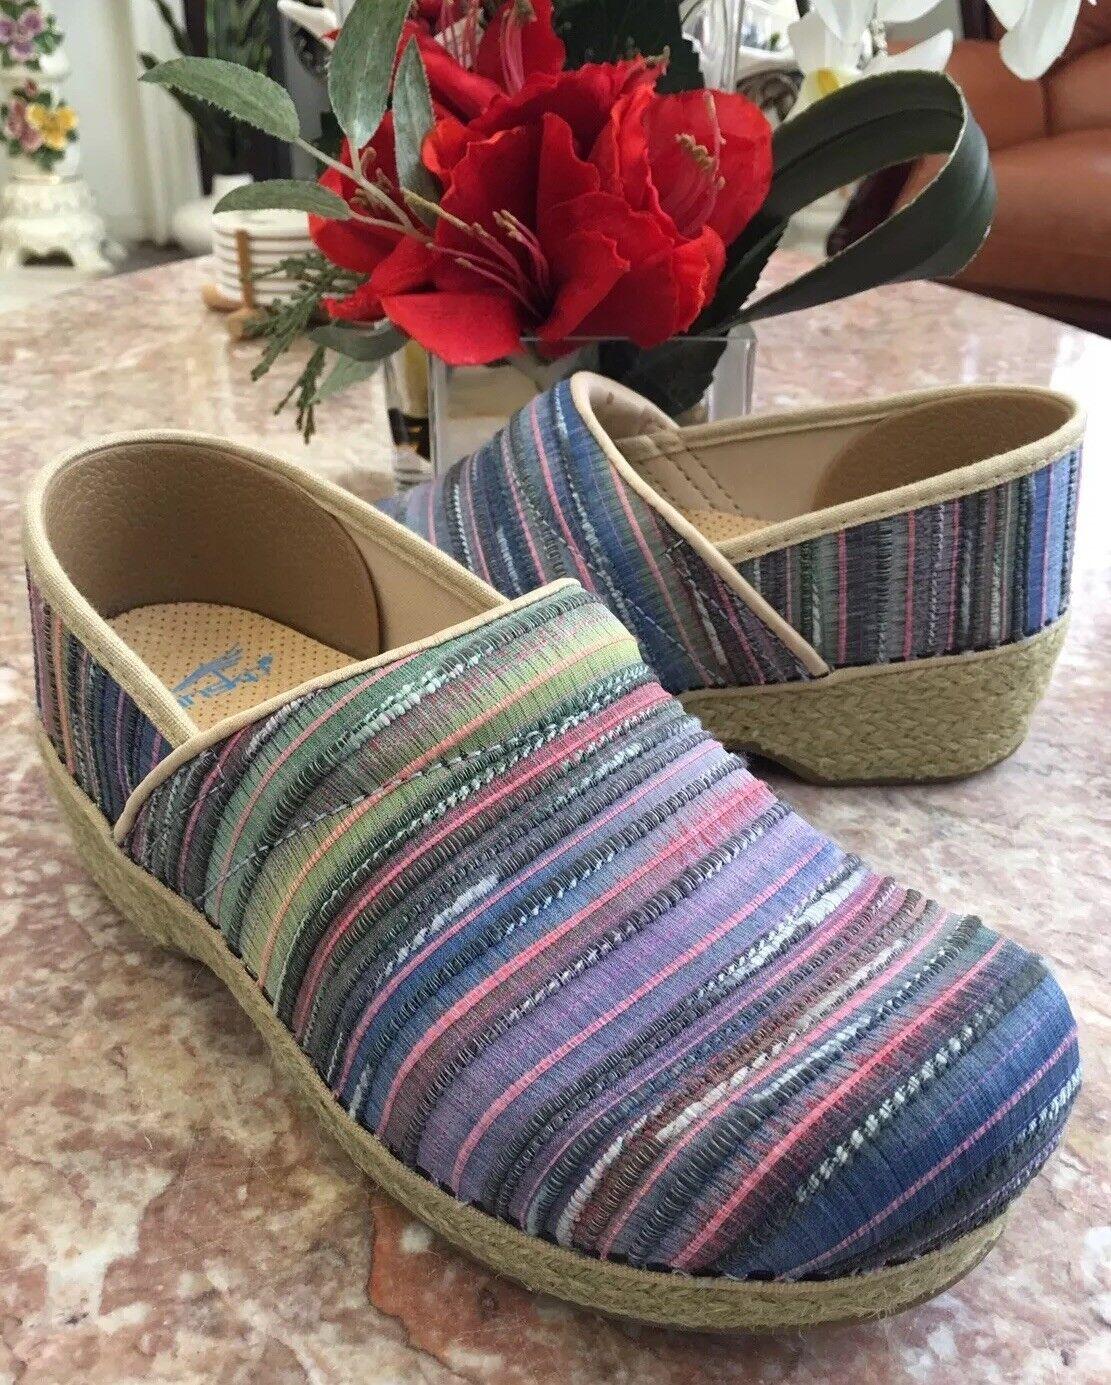 New Dansko Professional Jute Pro Artisan Weave Multicolor Clog Sz US 7.5-8/EU 38